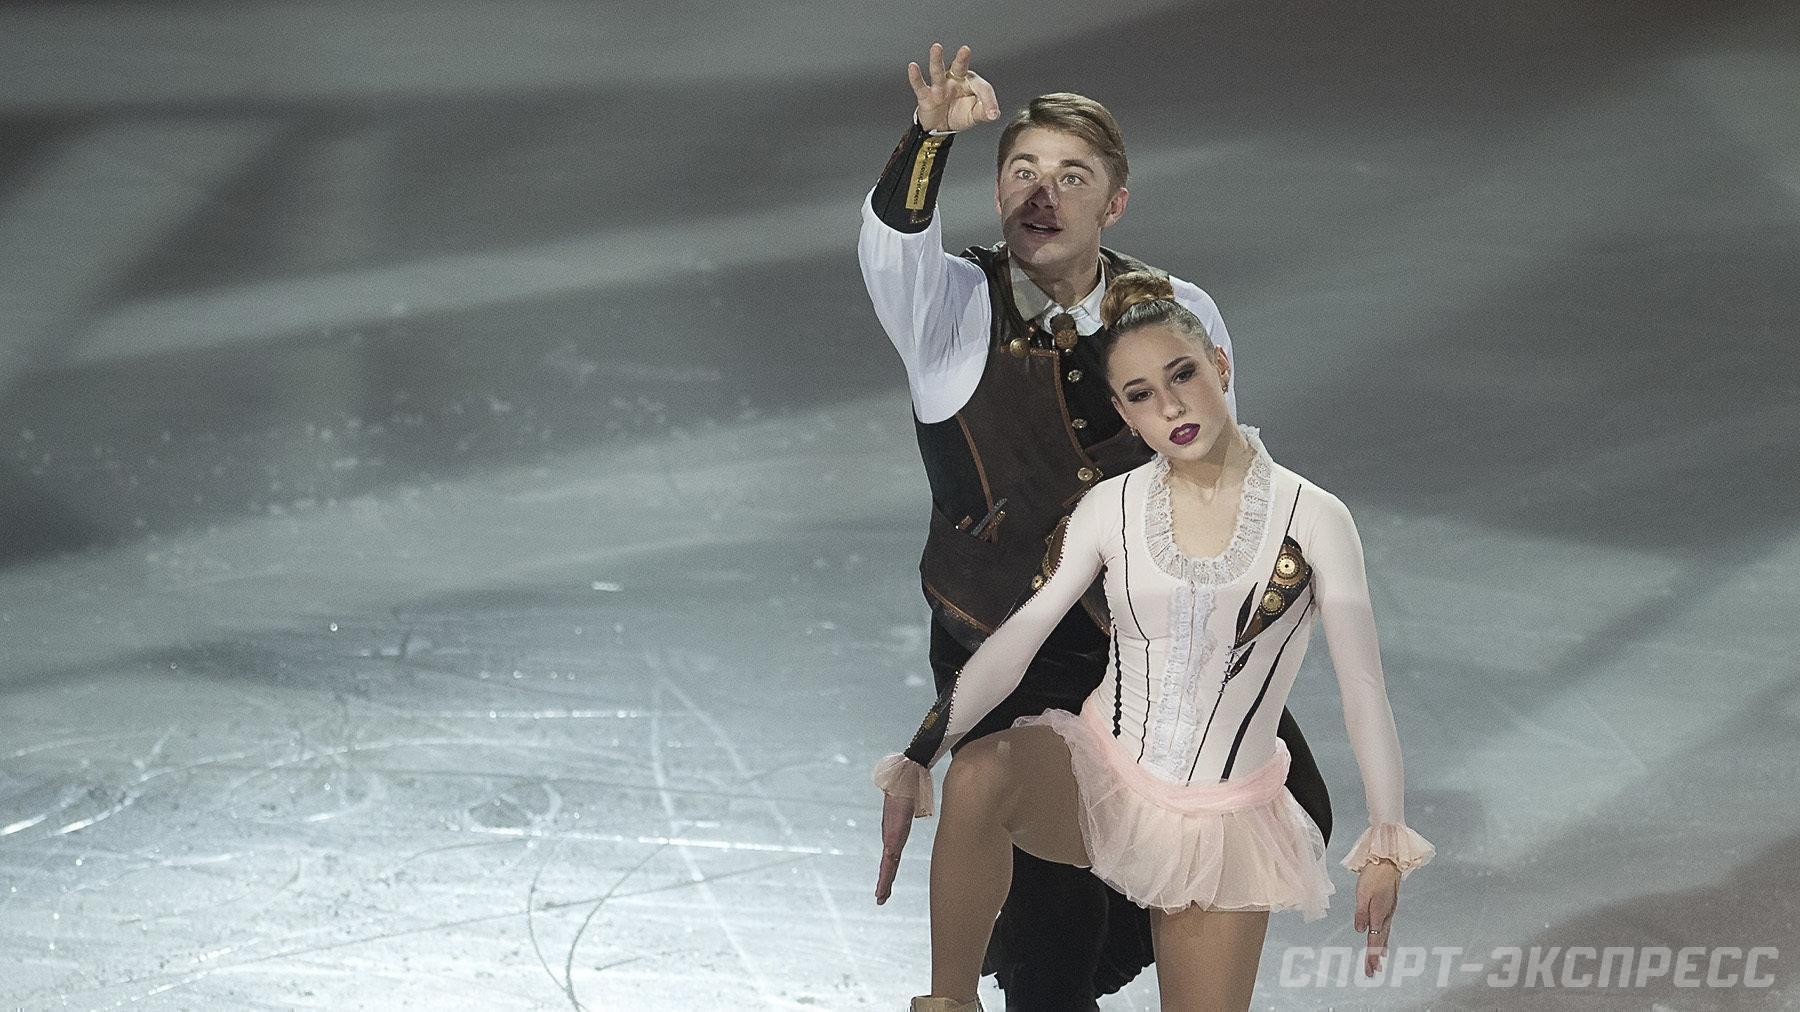 Кристина Астахова-Алексей Рогонов - Страница 38 Origin